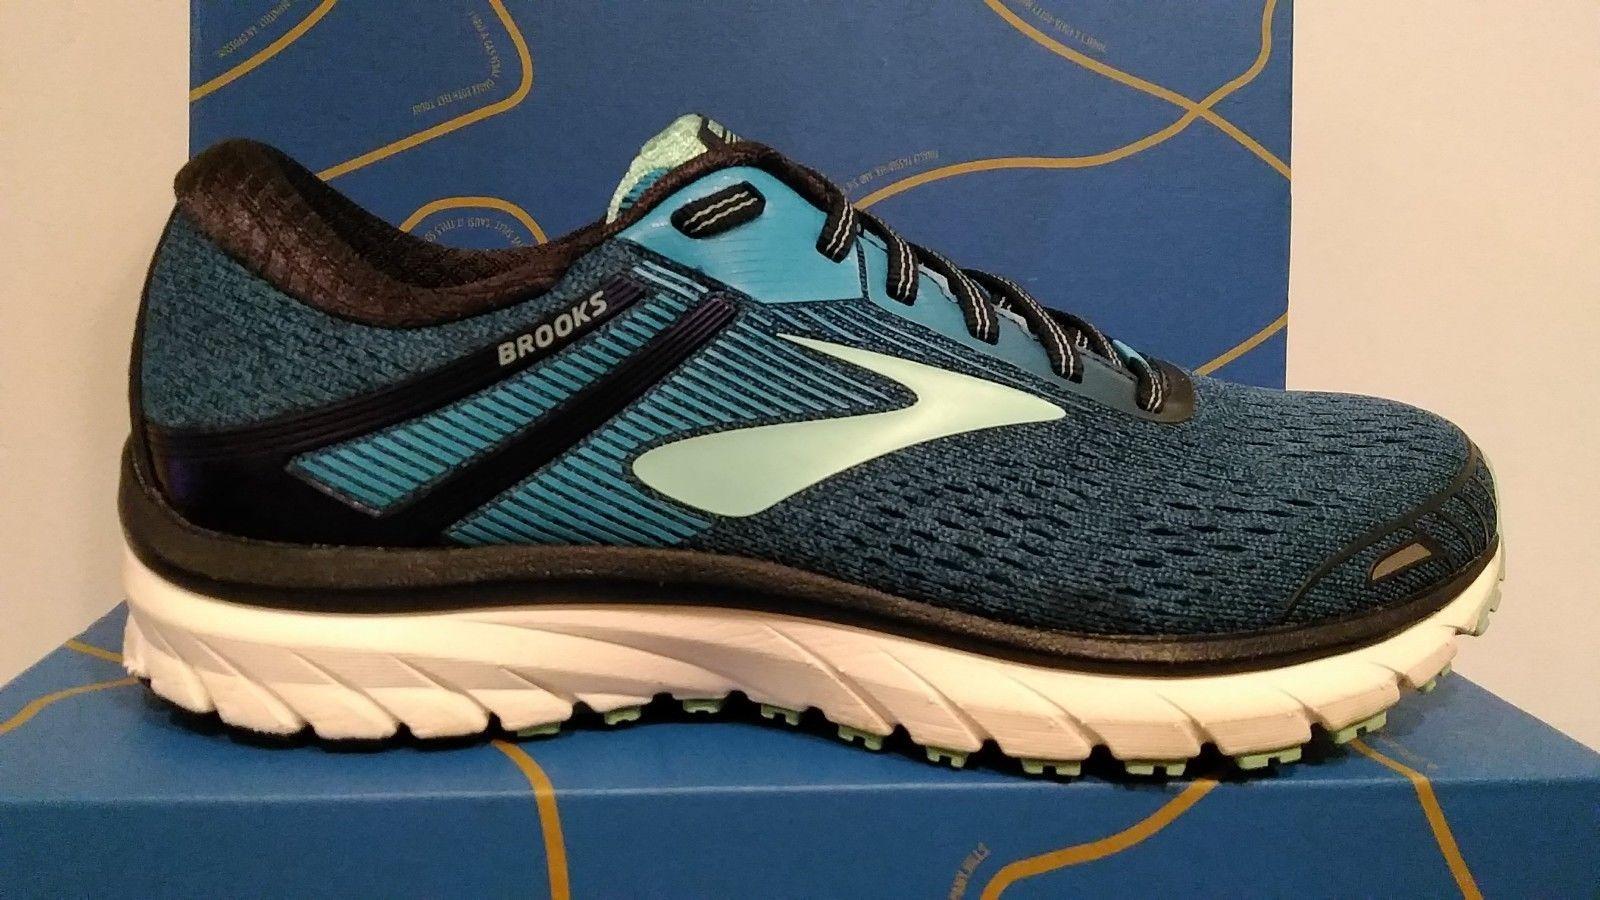 90a9f1993ef66 Brooks Adrenaline GTS 18 Women s Running Shoes Size 9.5